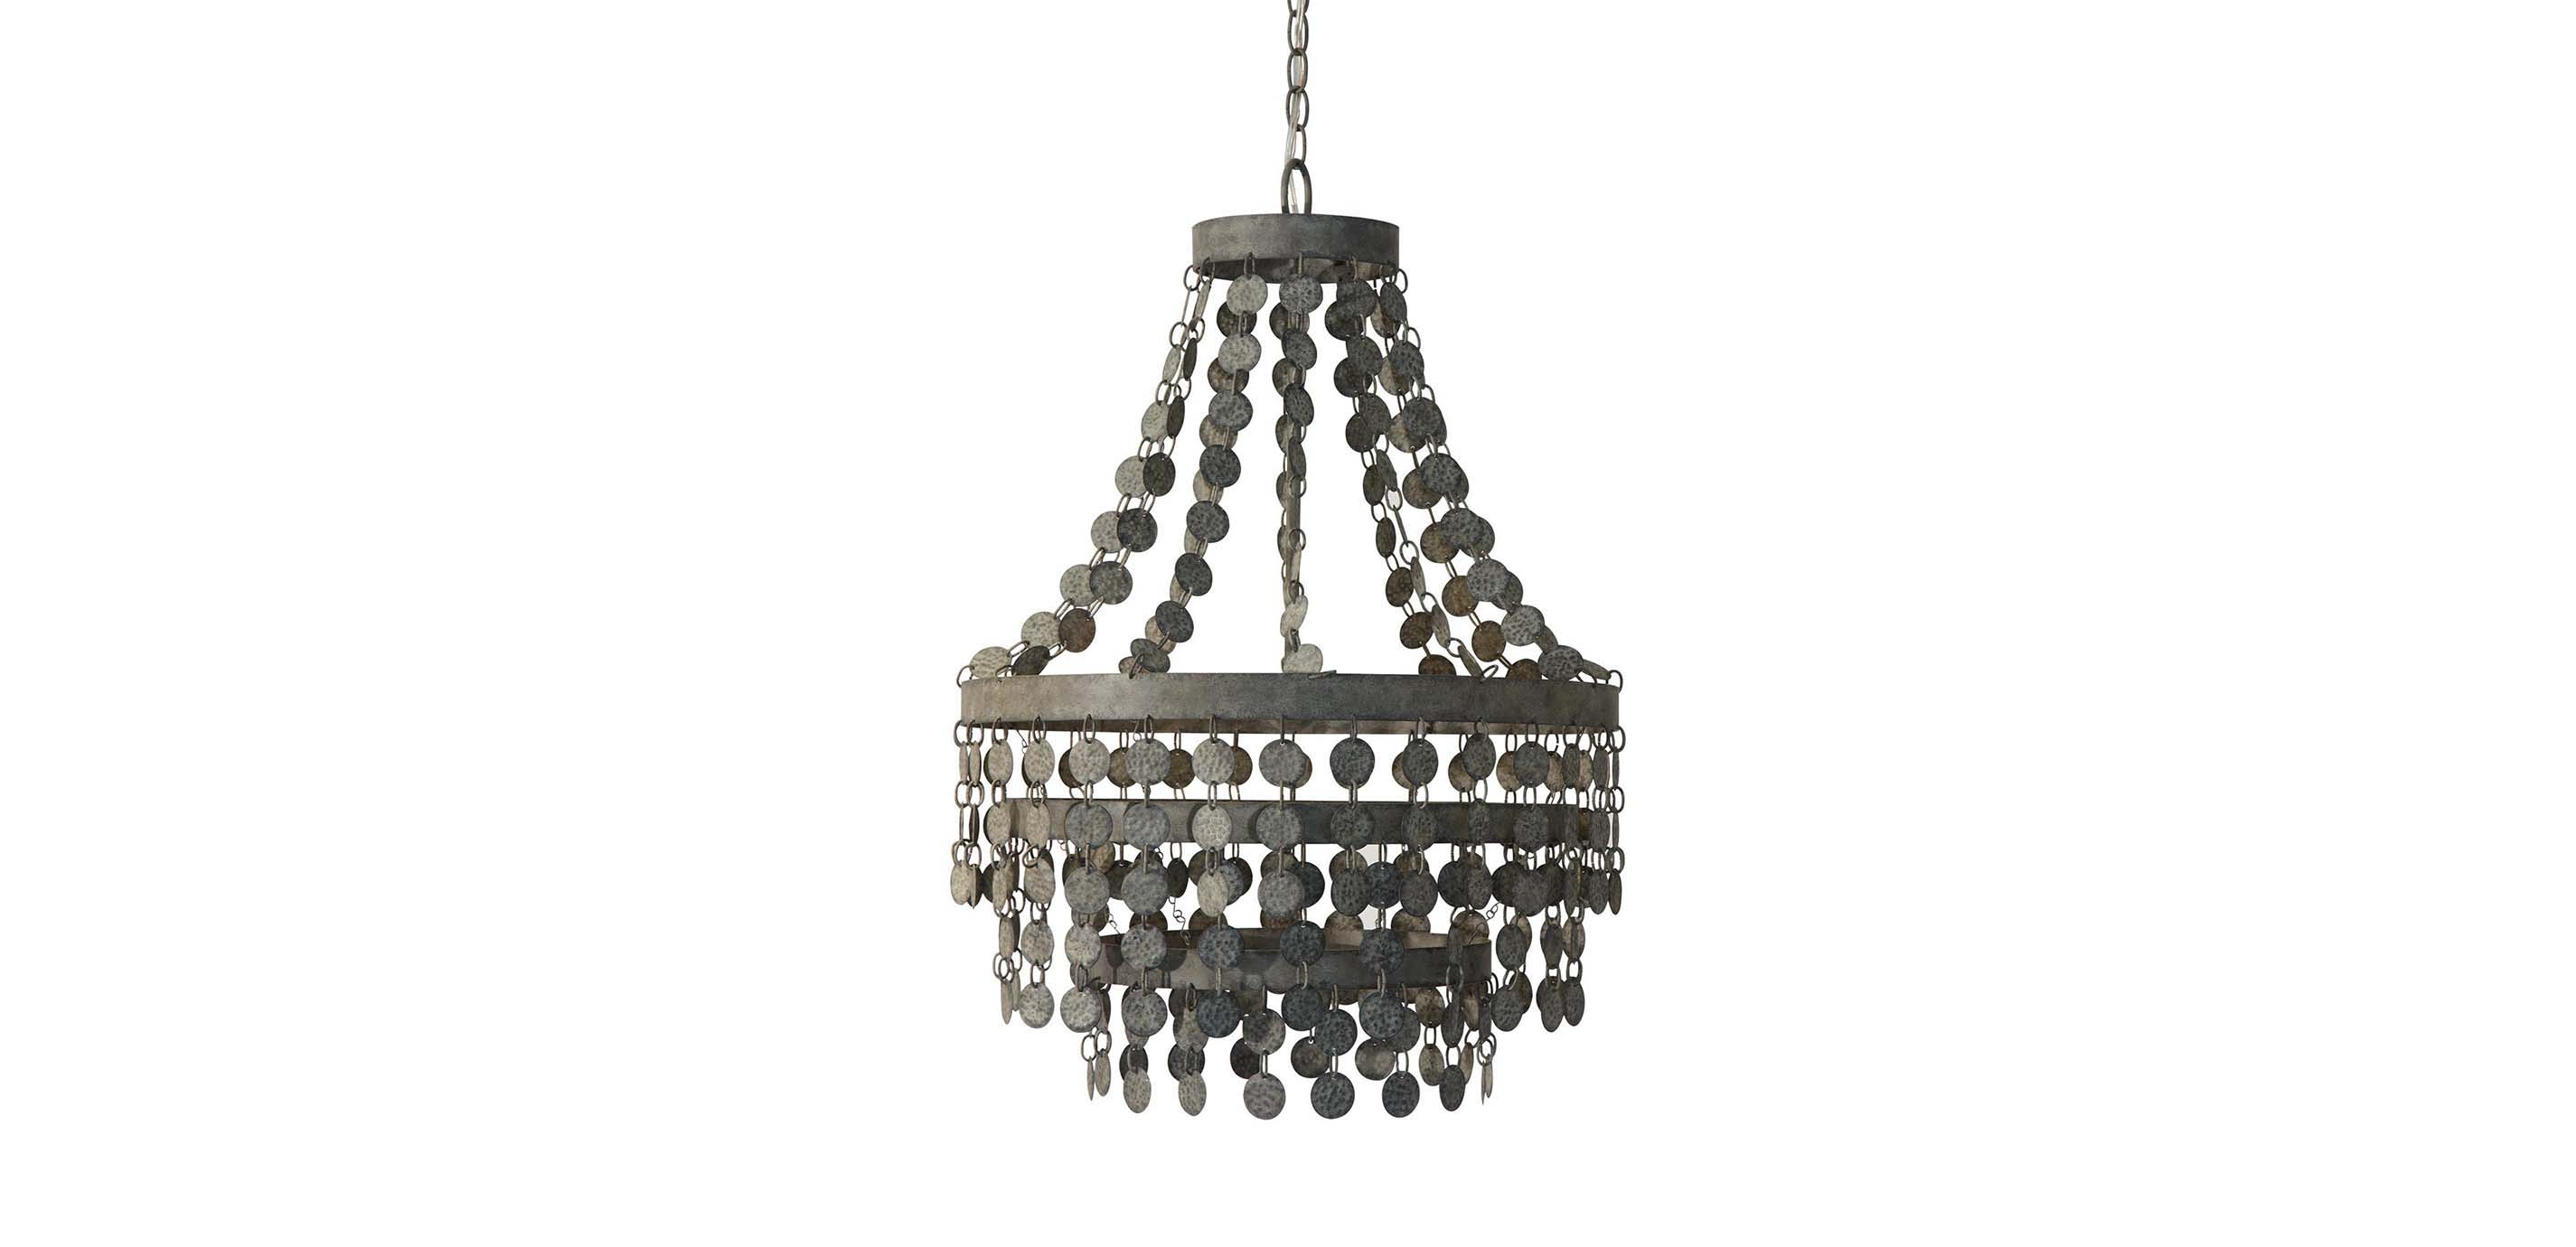 Hudson chandelier chandeliers images hudson chandelier largegray arubaitofo Images